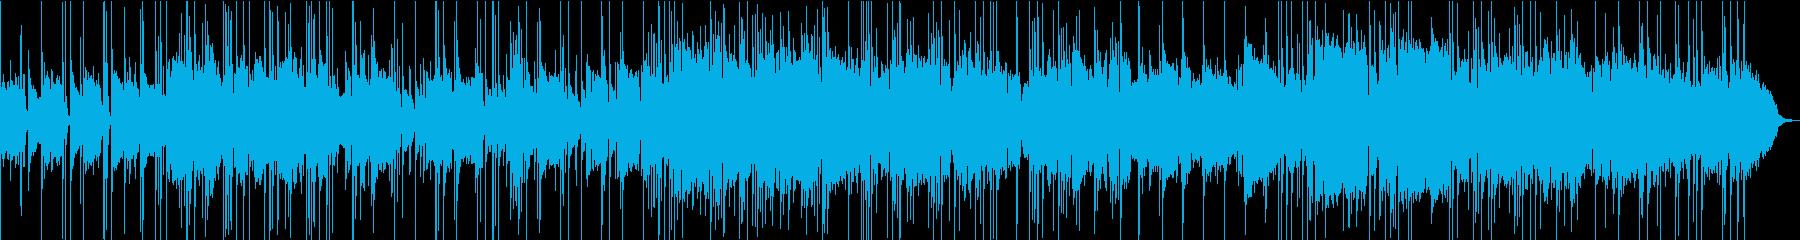 70sのUKプログレ風のポップロックの再生済みの波形